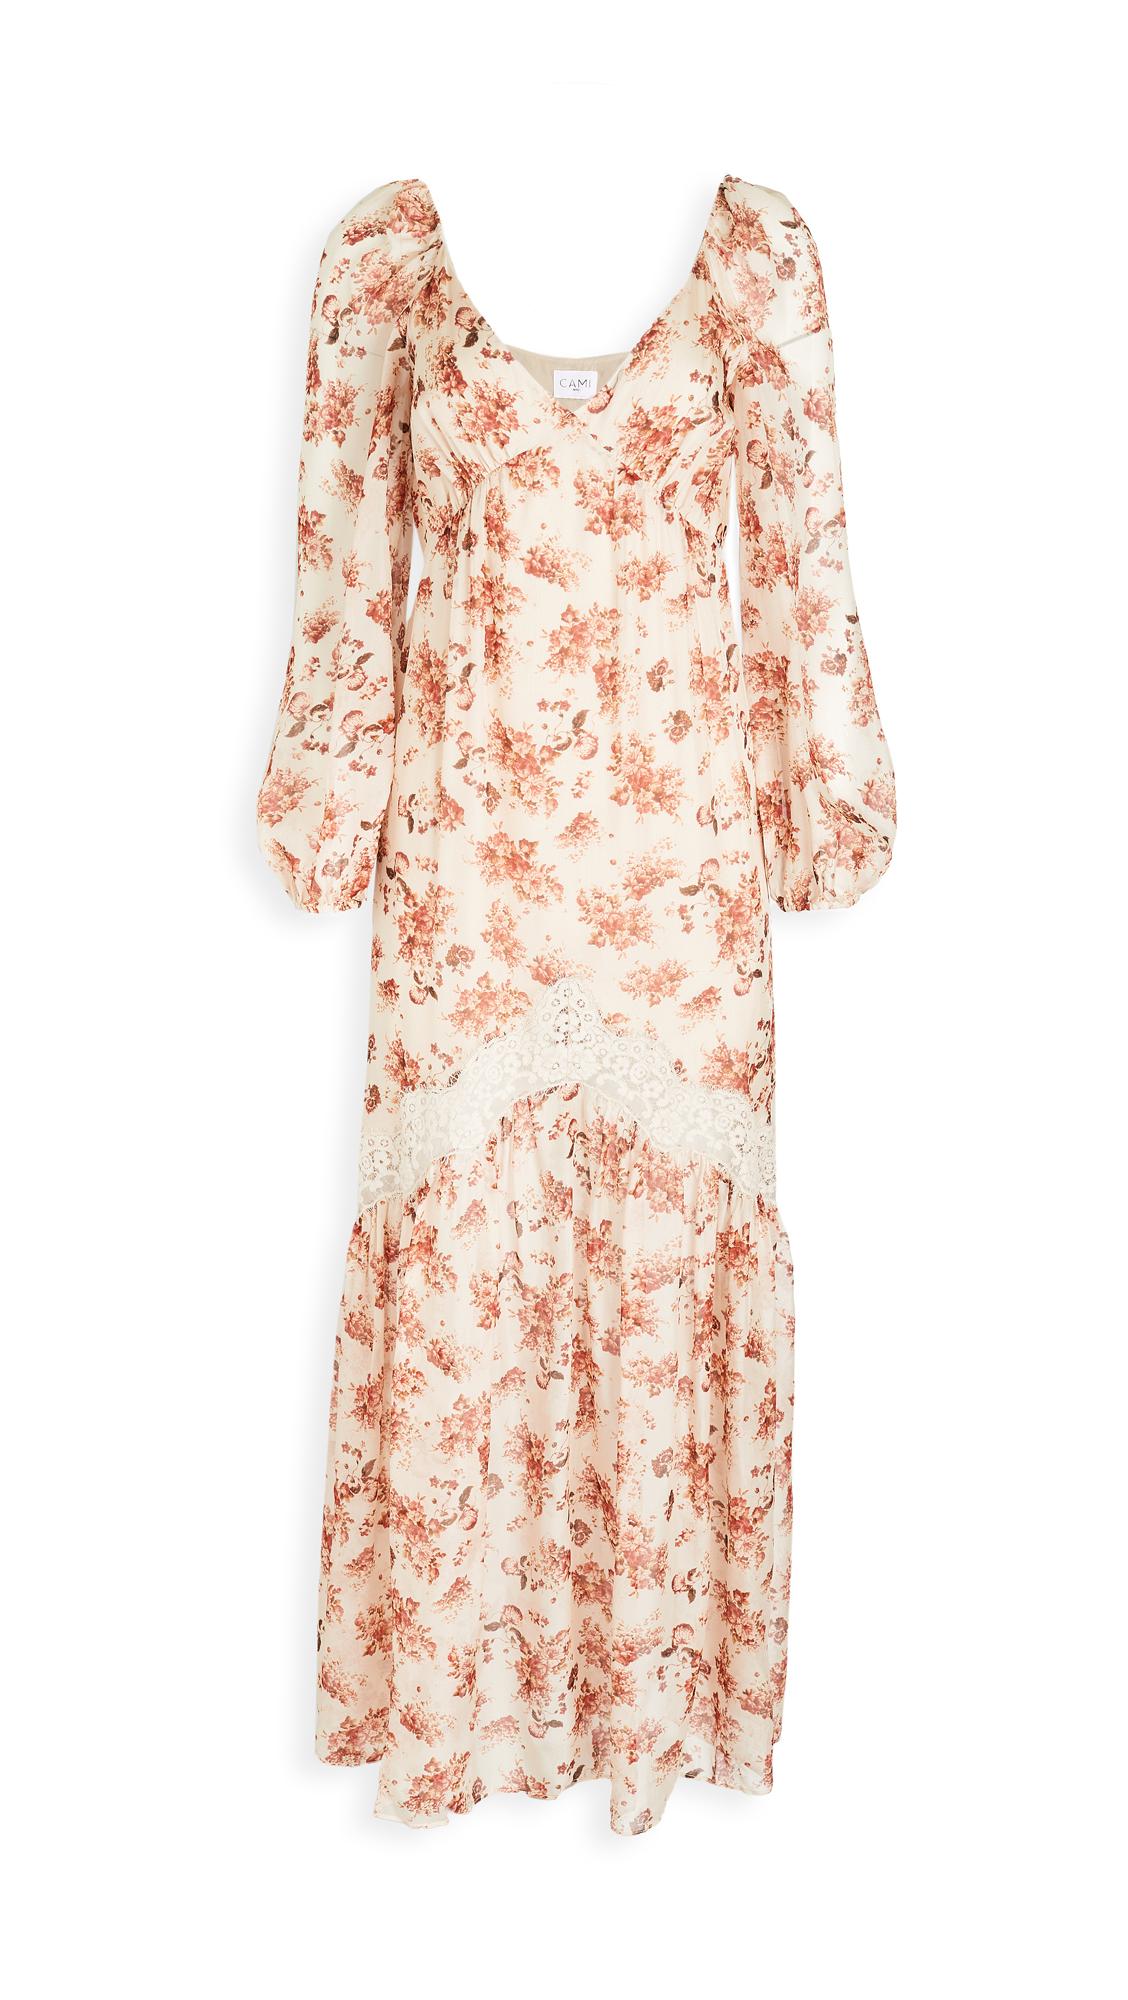 CAMI NYC The Francie Dress